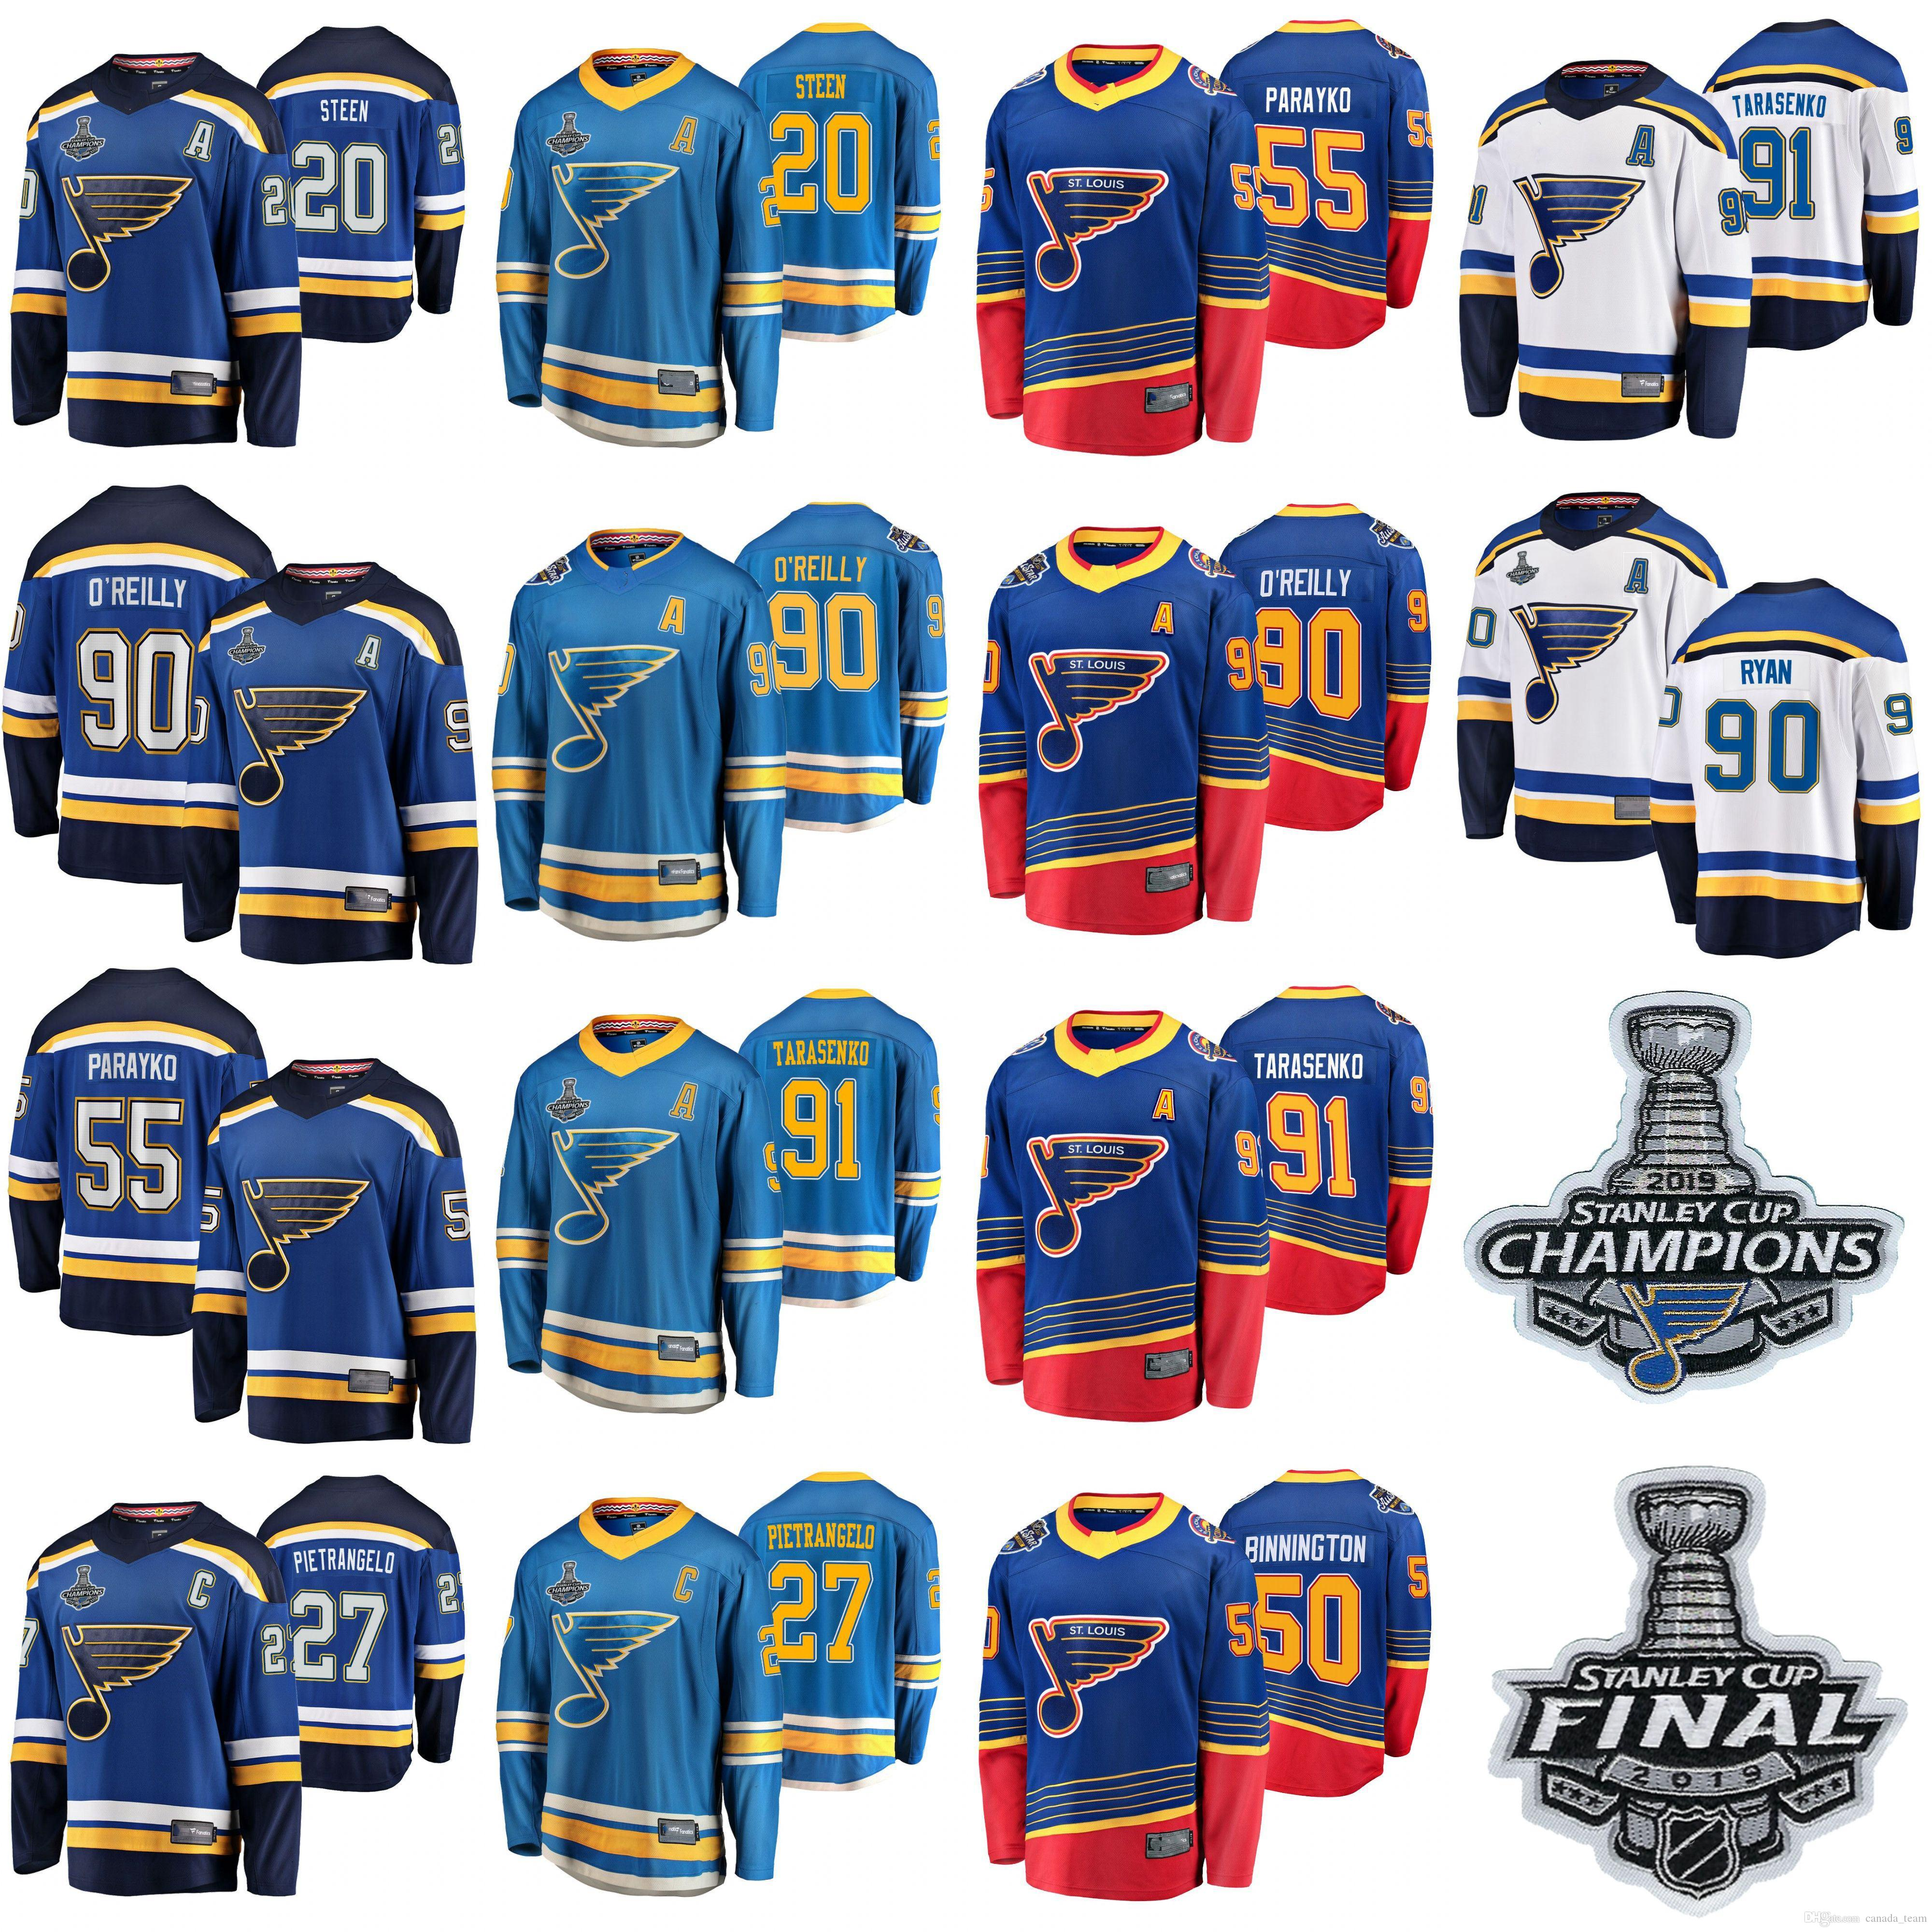 St. Louis Blues 2019 Stanley Copa Final Champions Hockey Jerseys Vladimir Tarasenko Jersey 90 Ryan O'Reilly Colton Parayko Steen costurado